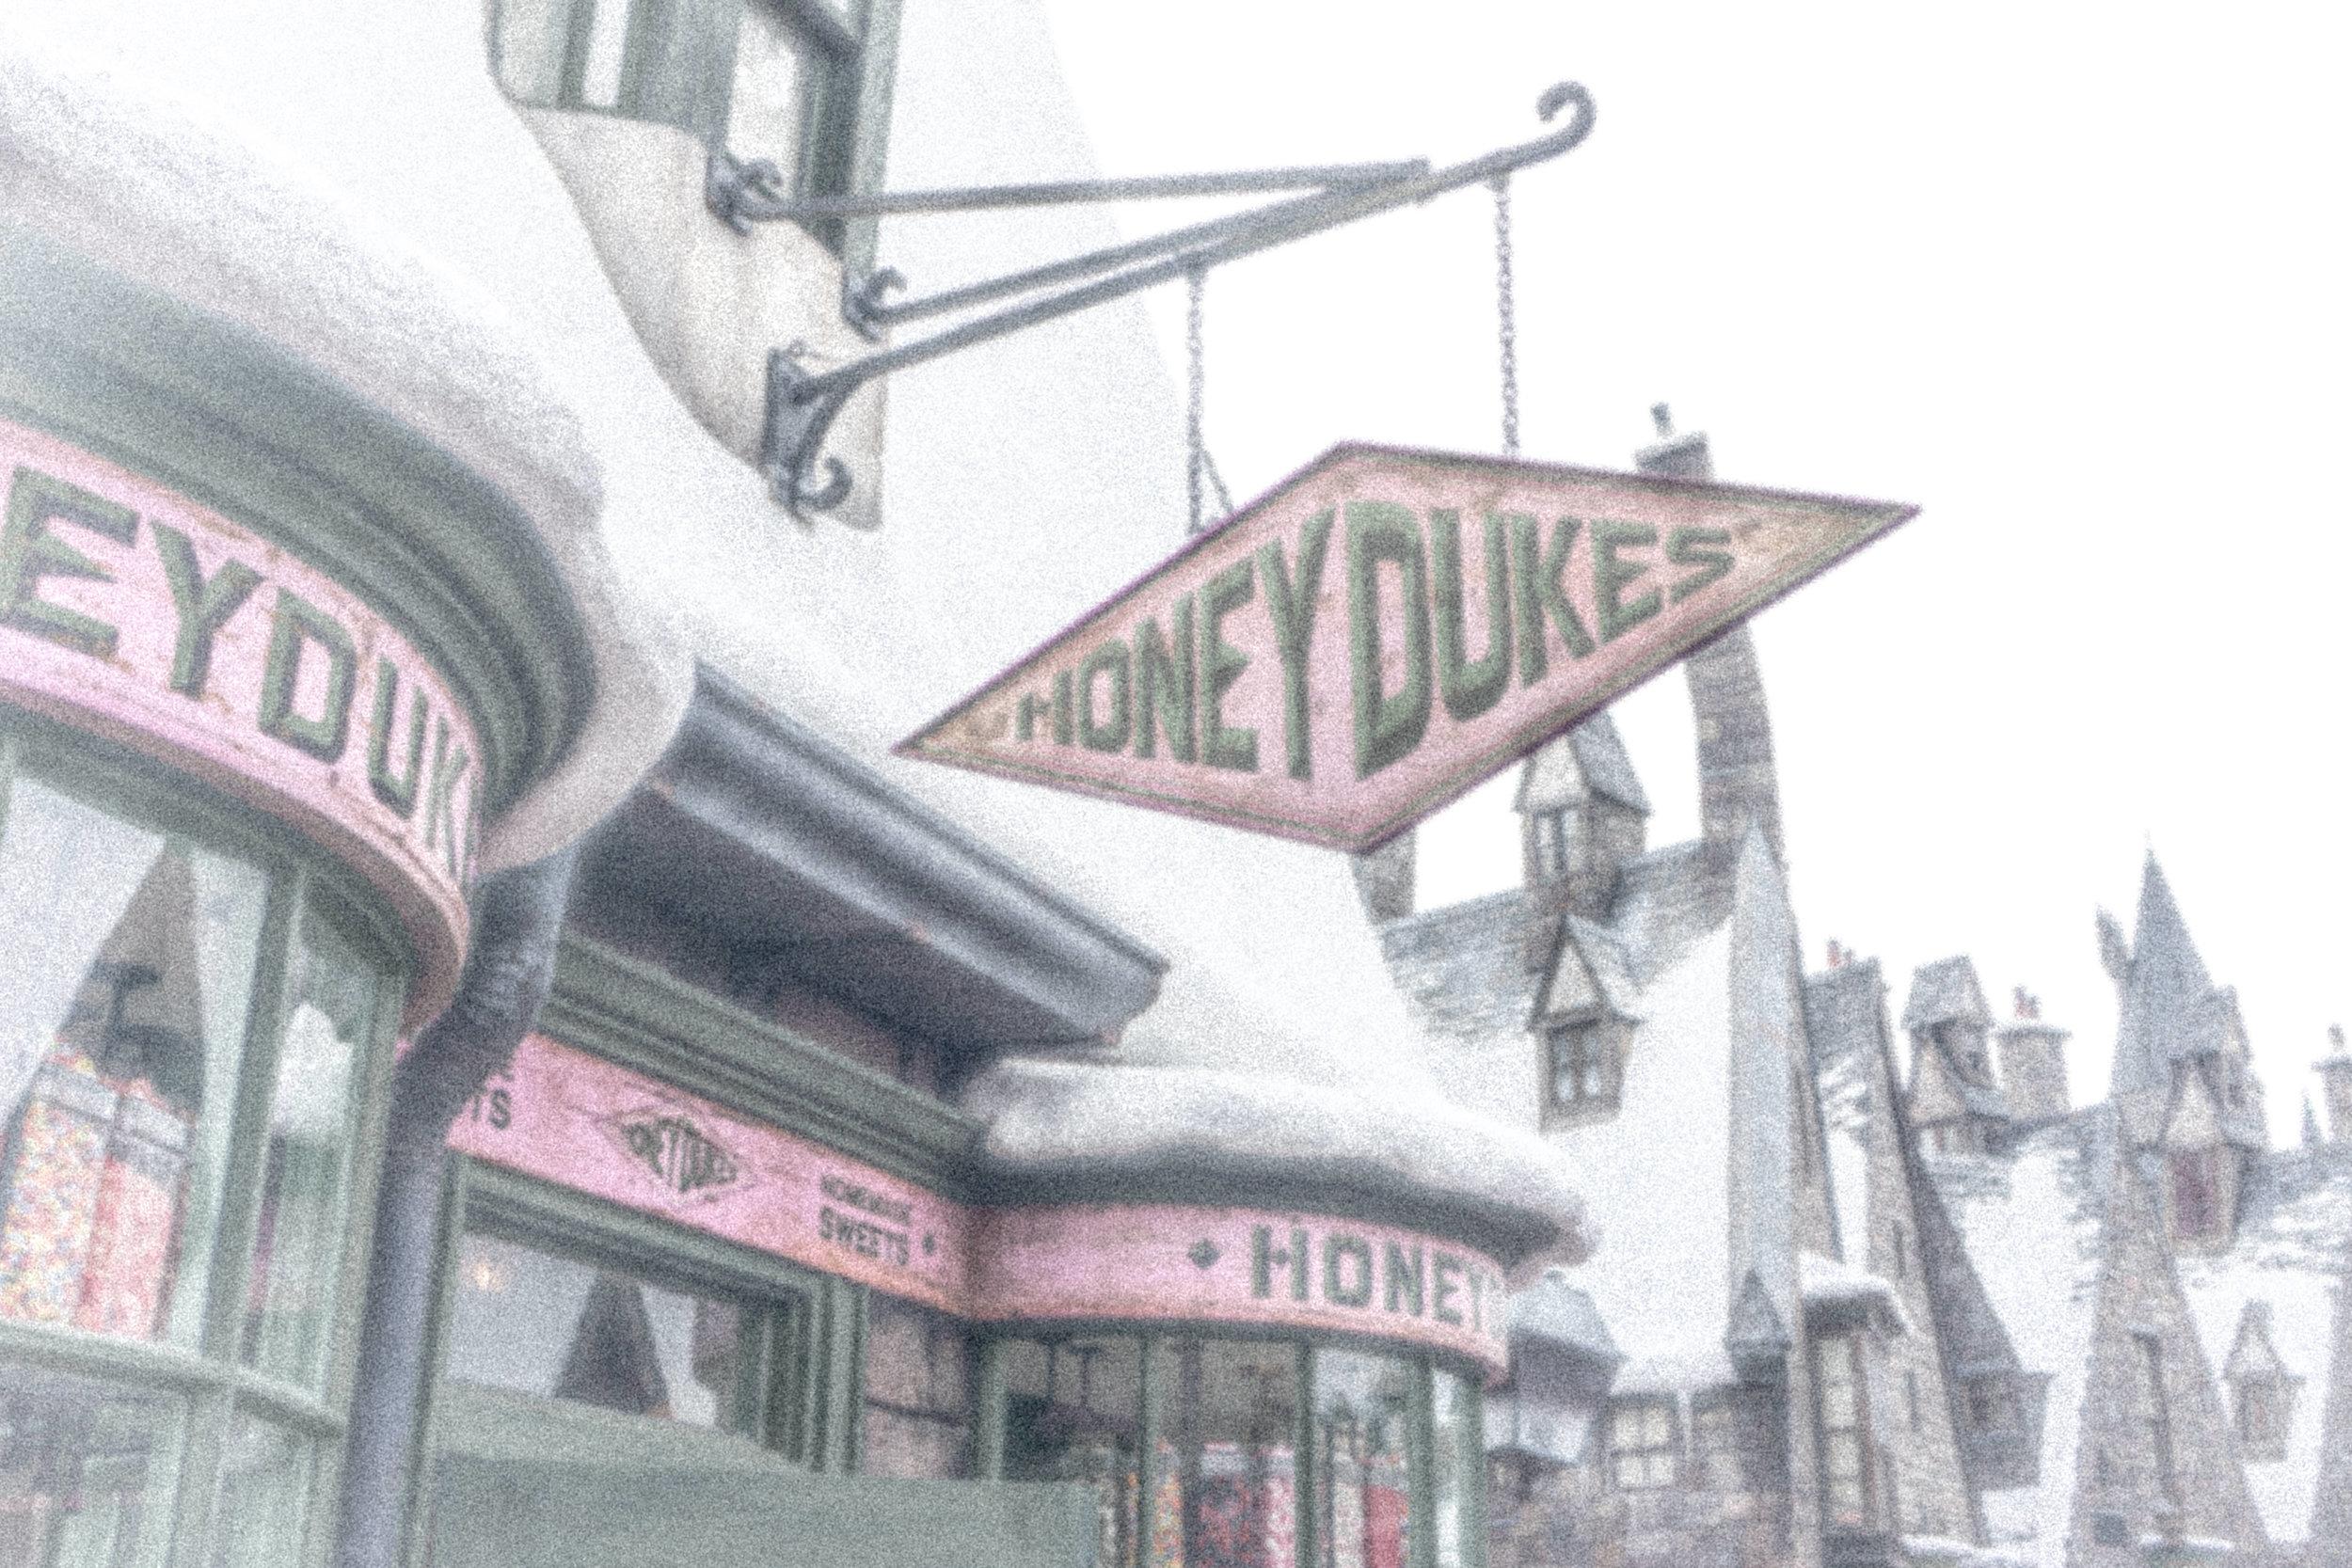 Honeydukes Snow Storm